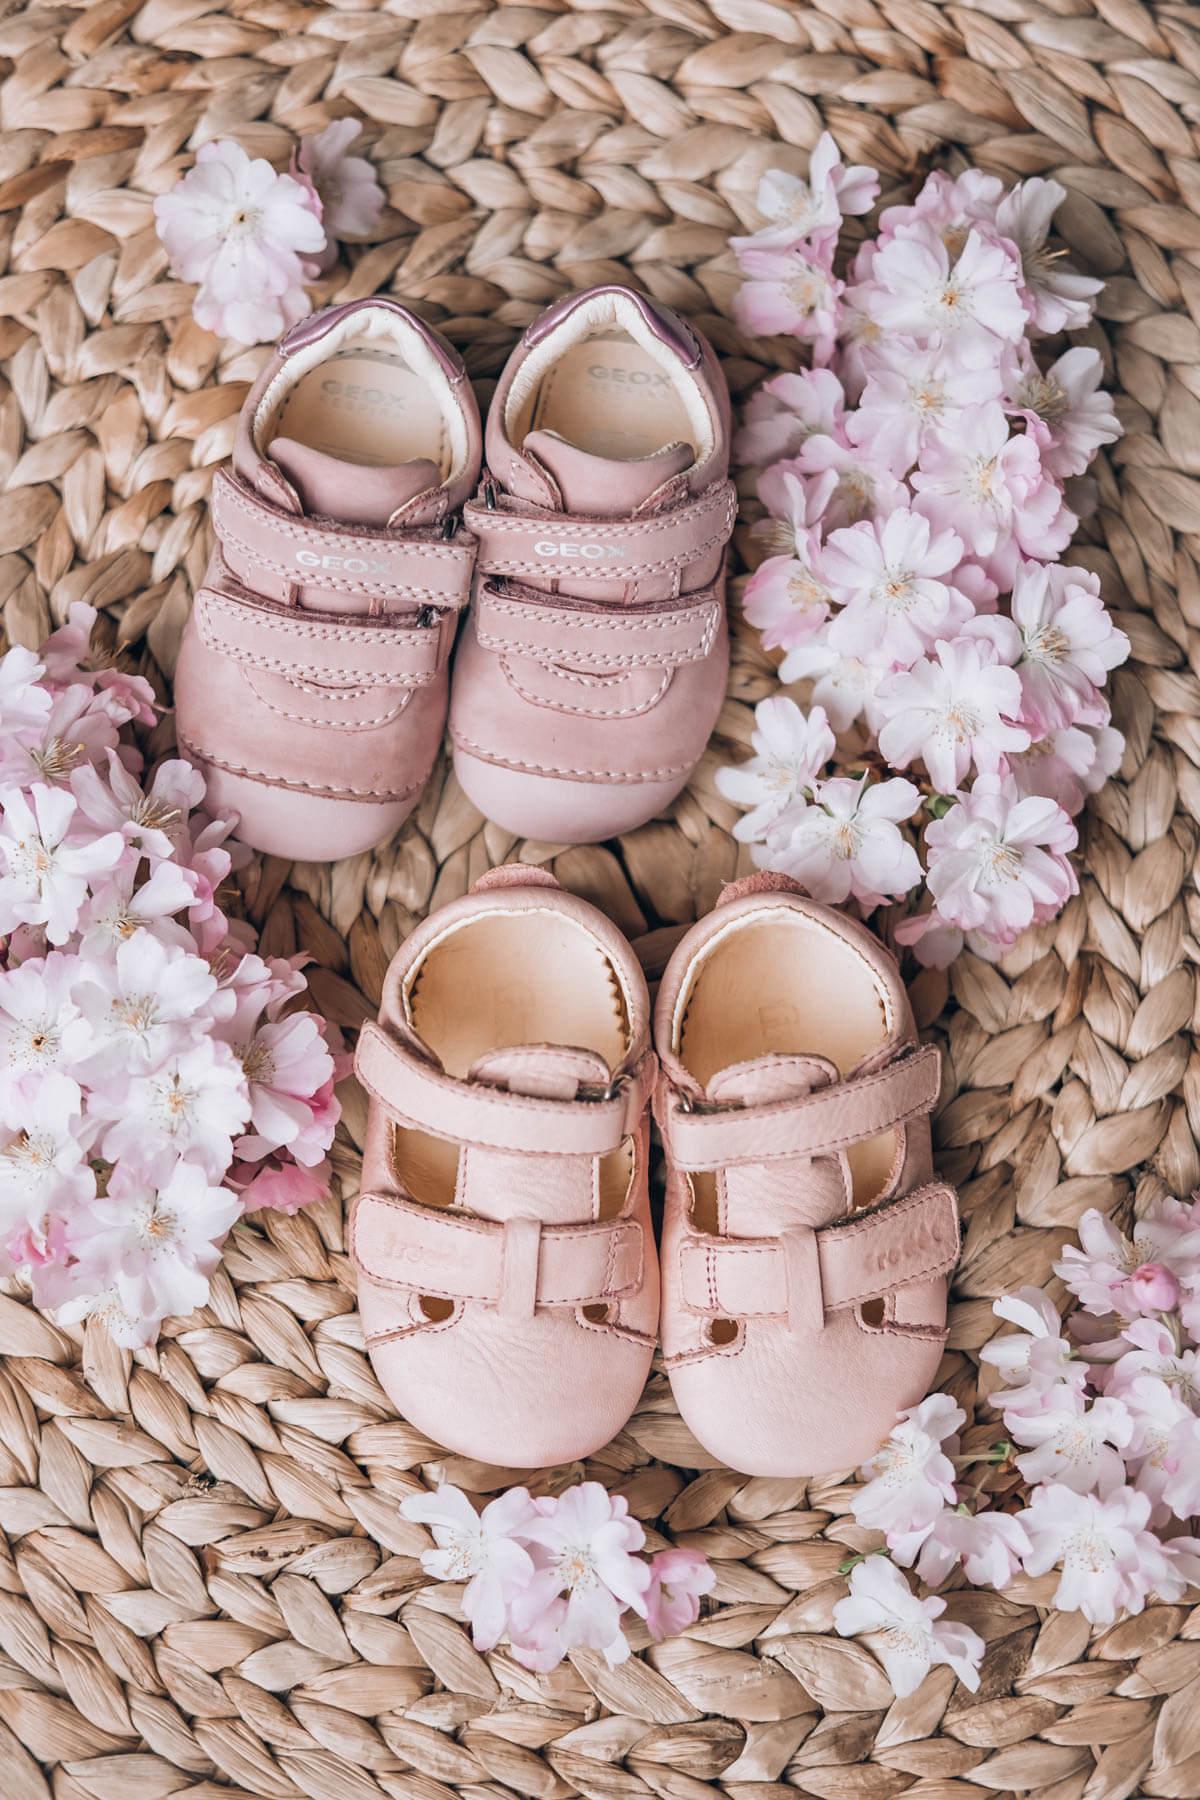 prvi čevlji za dojenčka